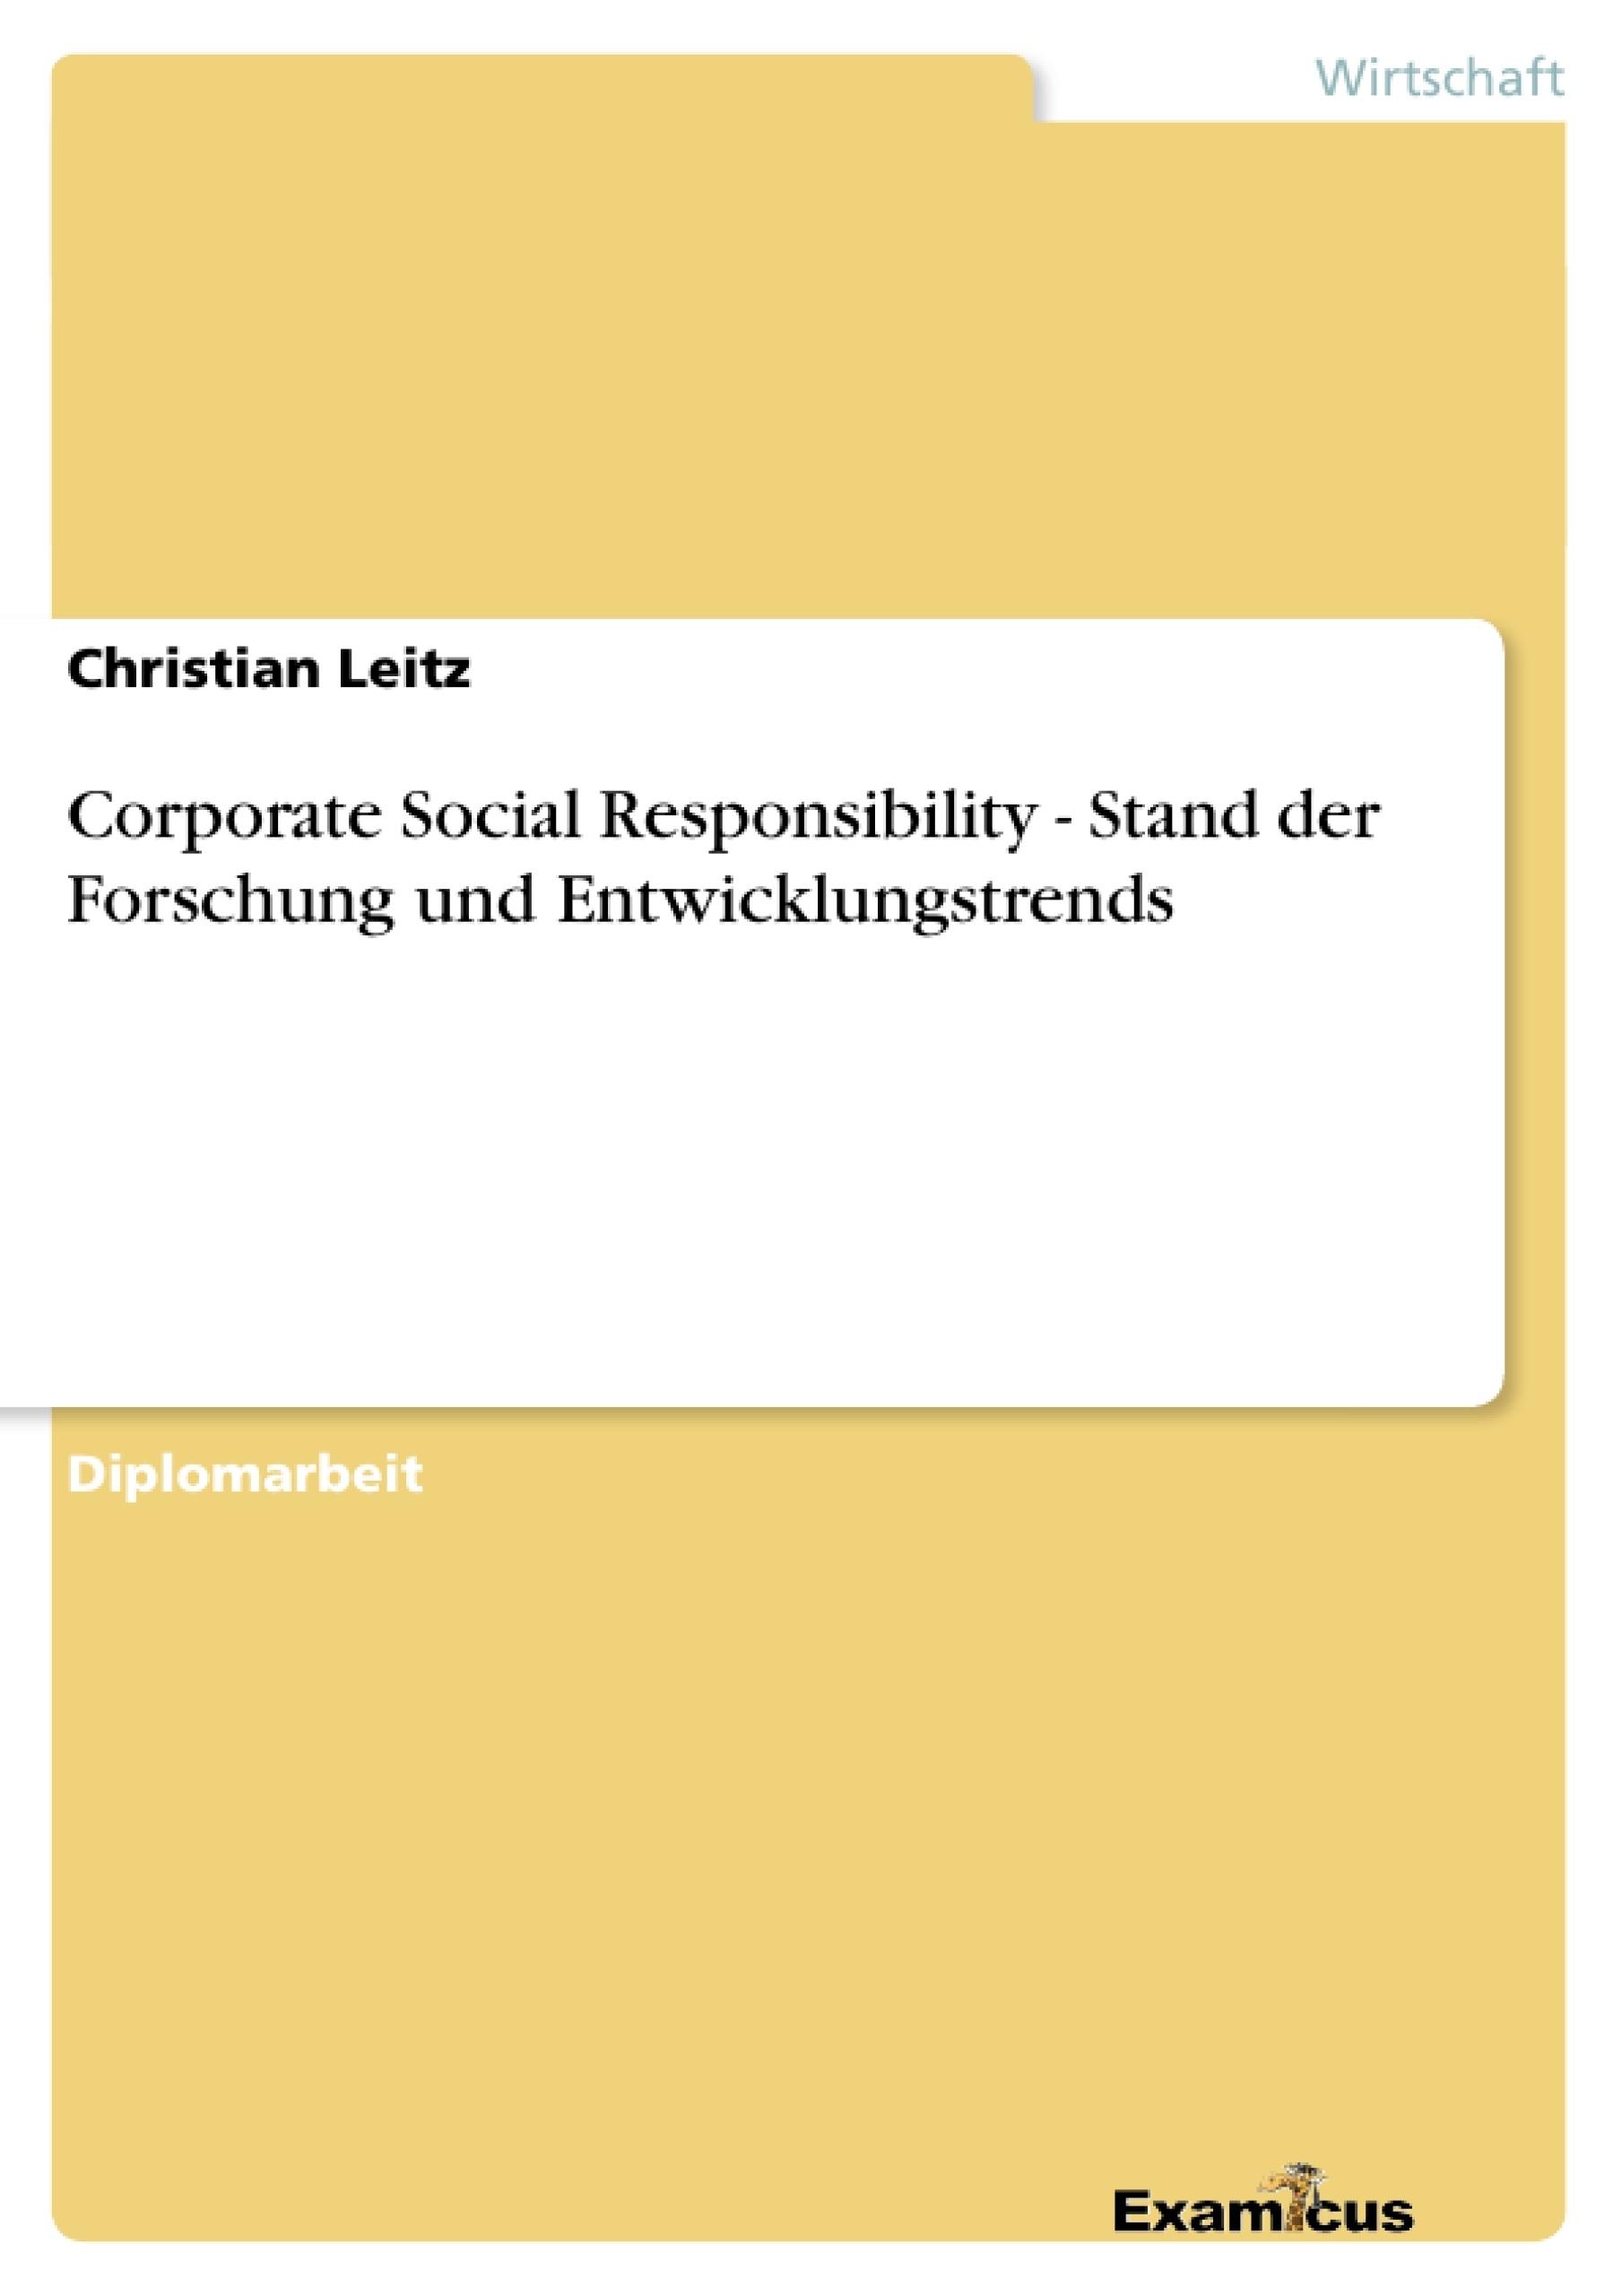 Titel: Corporate Social Responsibility - Stand der Forschung und Entwicklungstrends